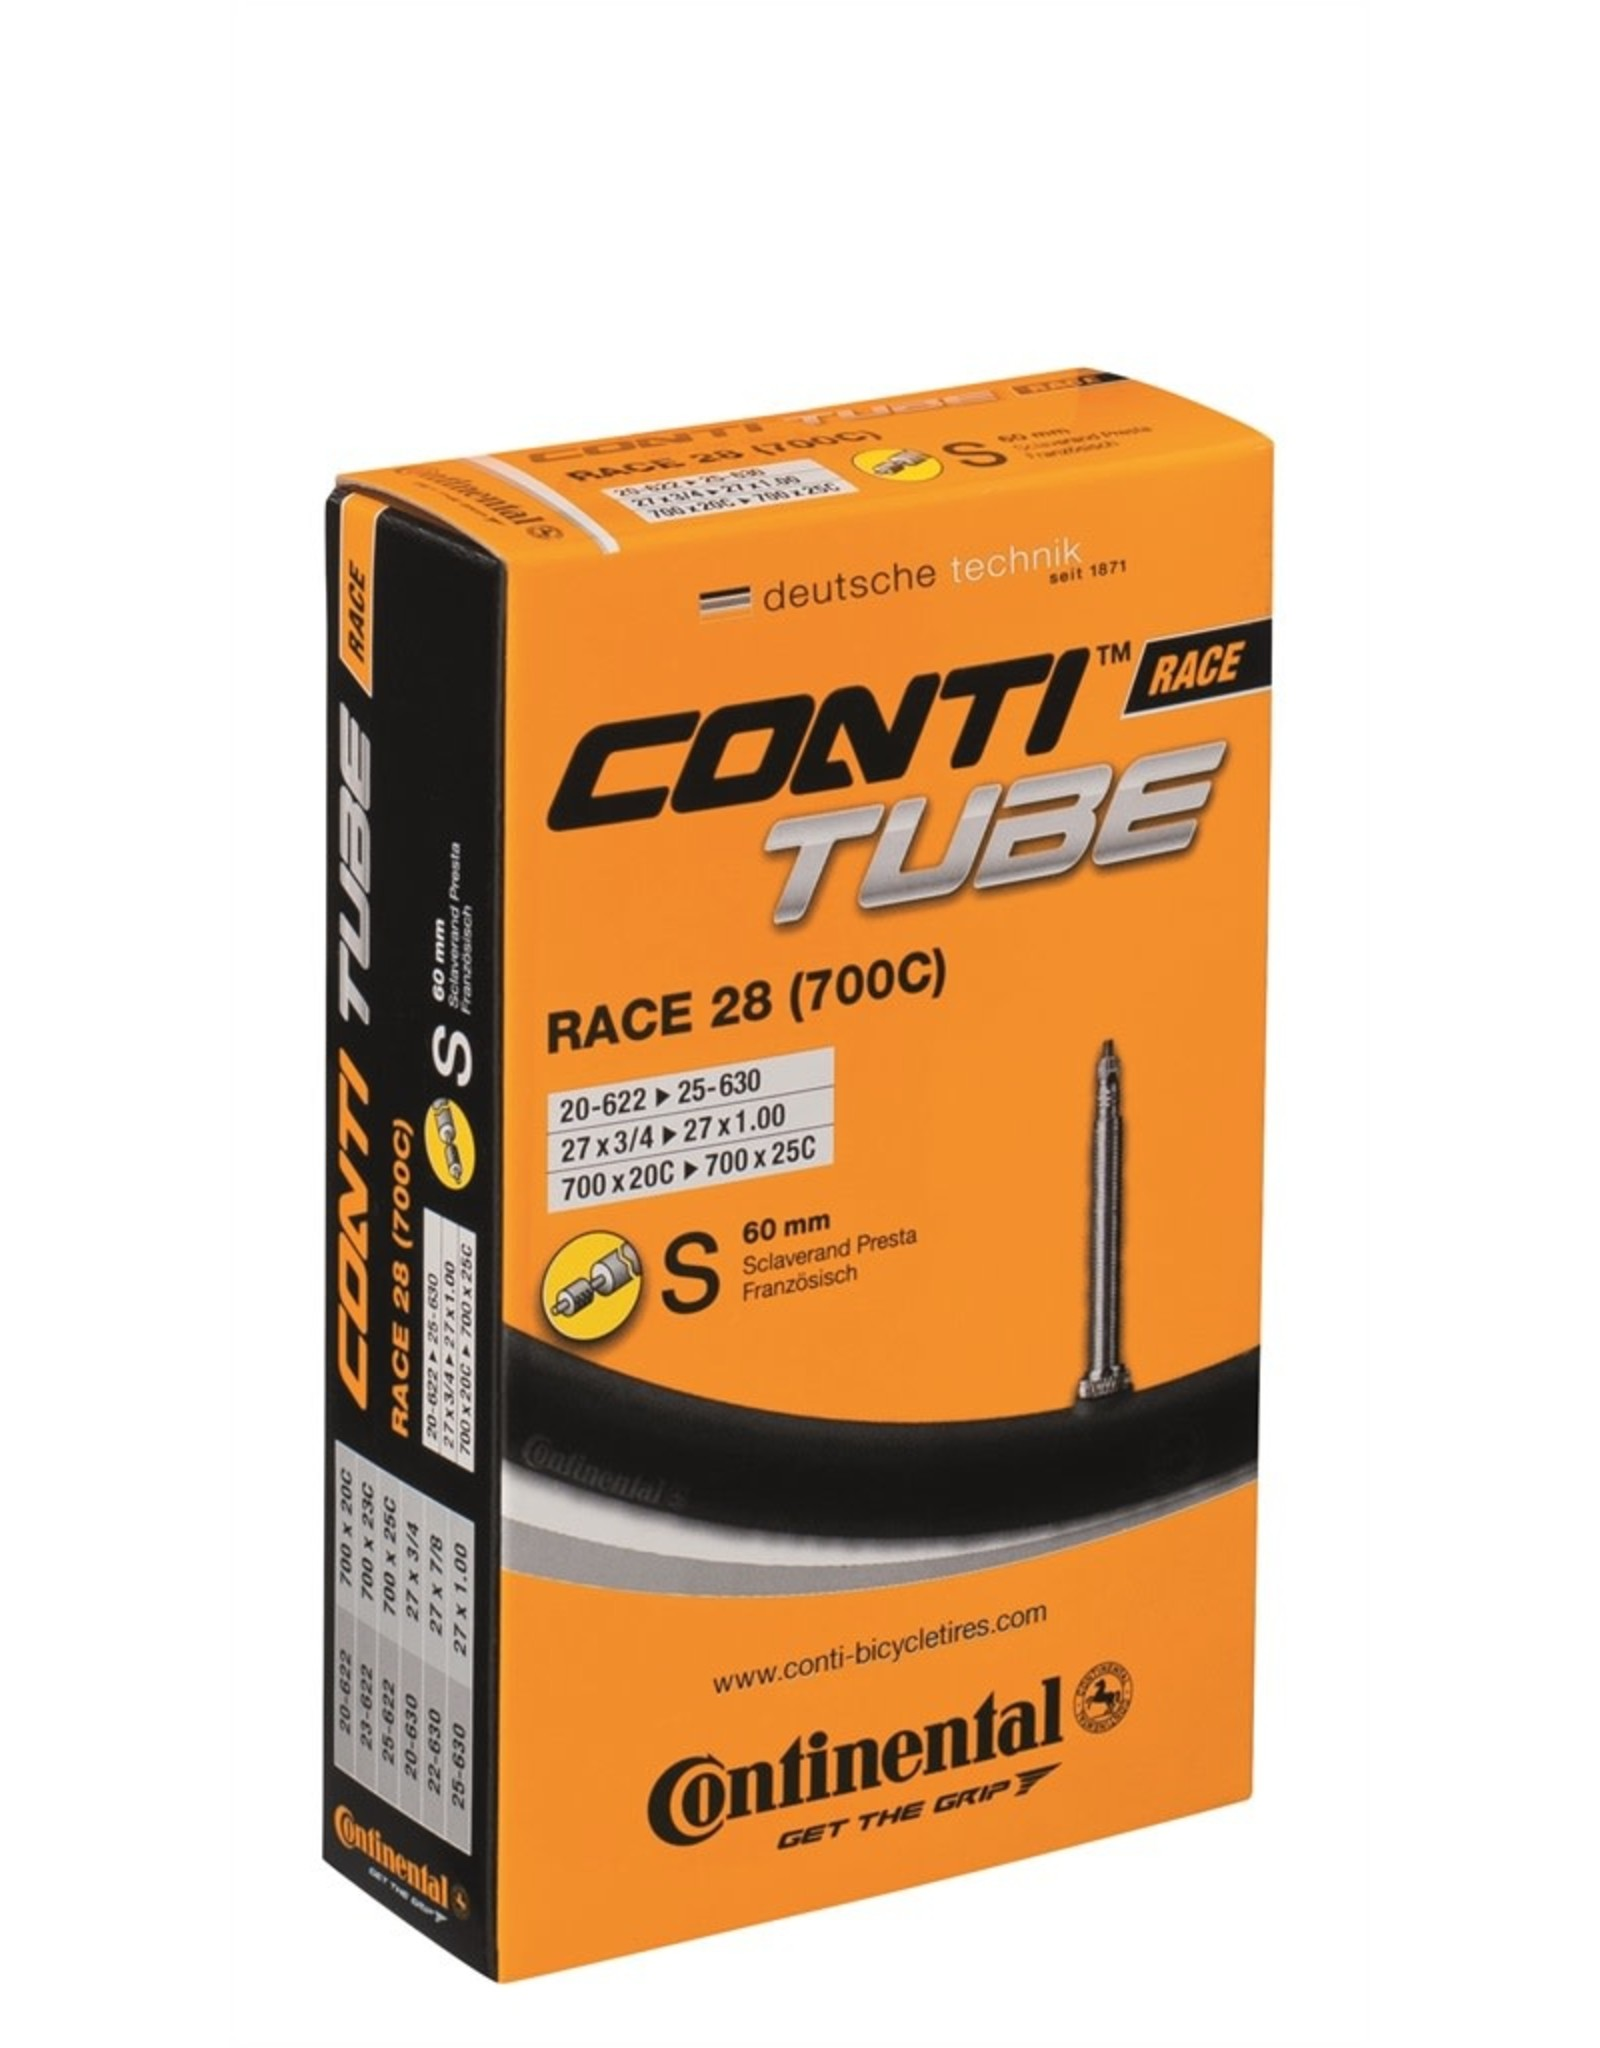 CONTINENTAL Continental Tube 700 X 18-25 - Presta Valve 60mm